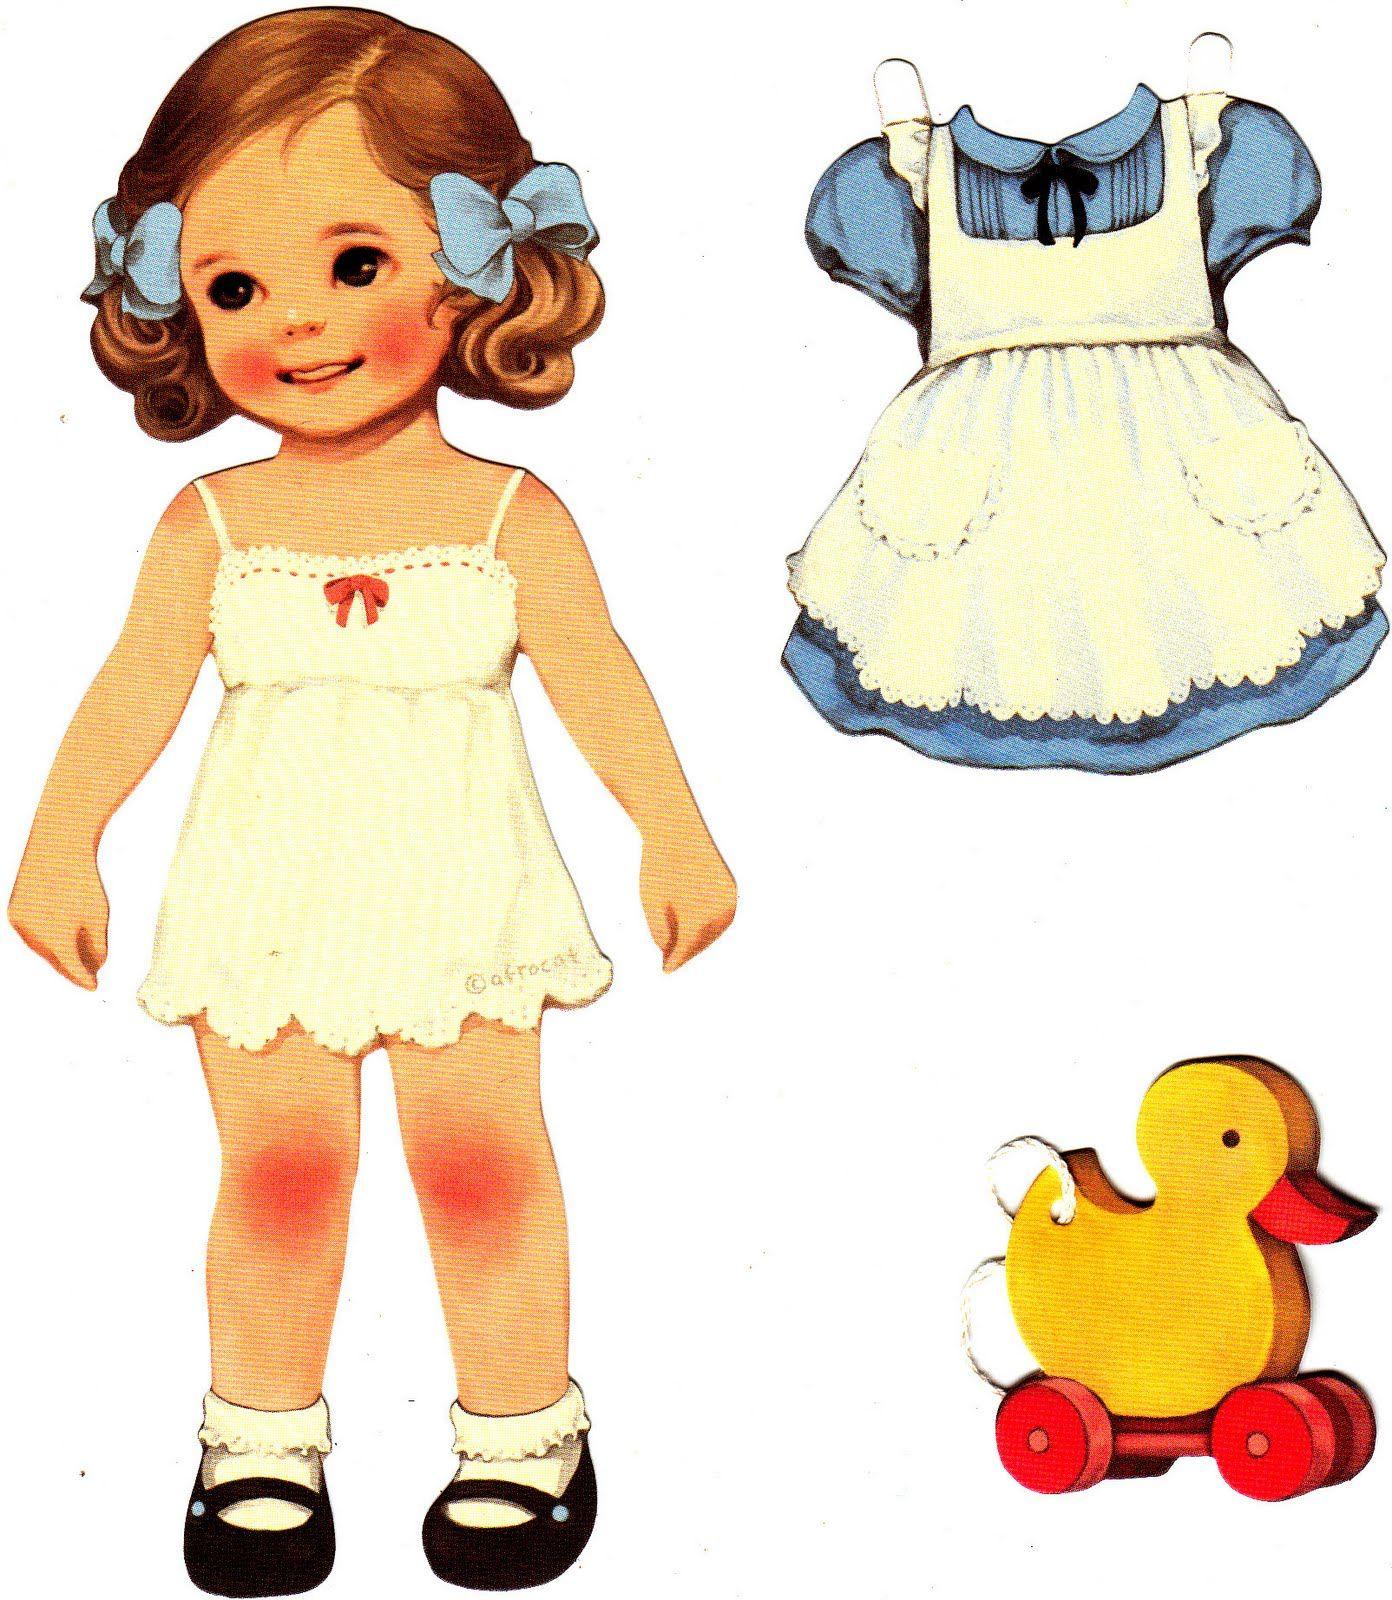 Paper Doll Mate Bonecas De Papel Vintage Bonecos De Papel Bonecas